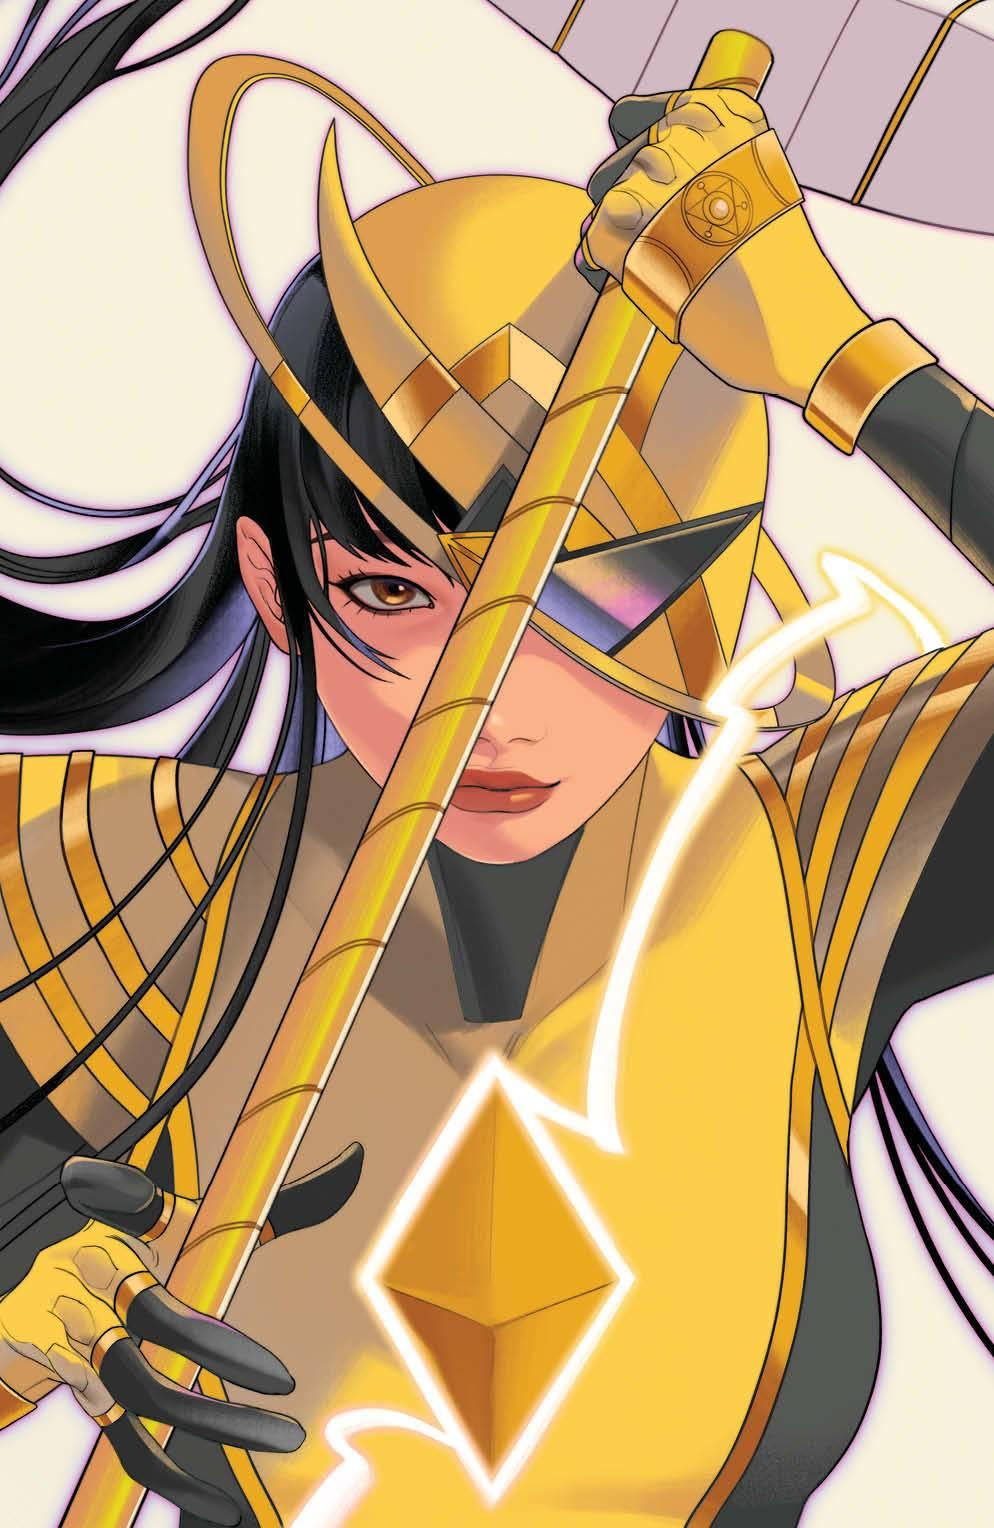 STL194185 ComicList Previews: POWER RANGERS #10